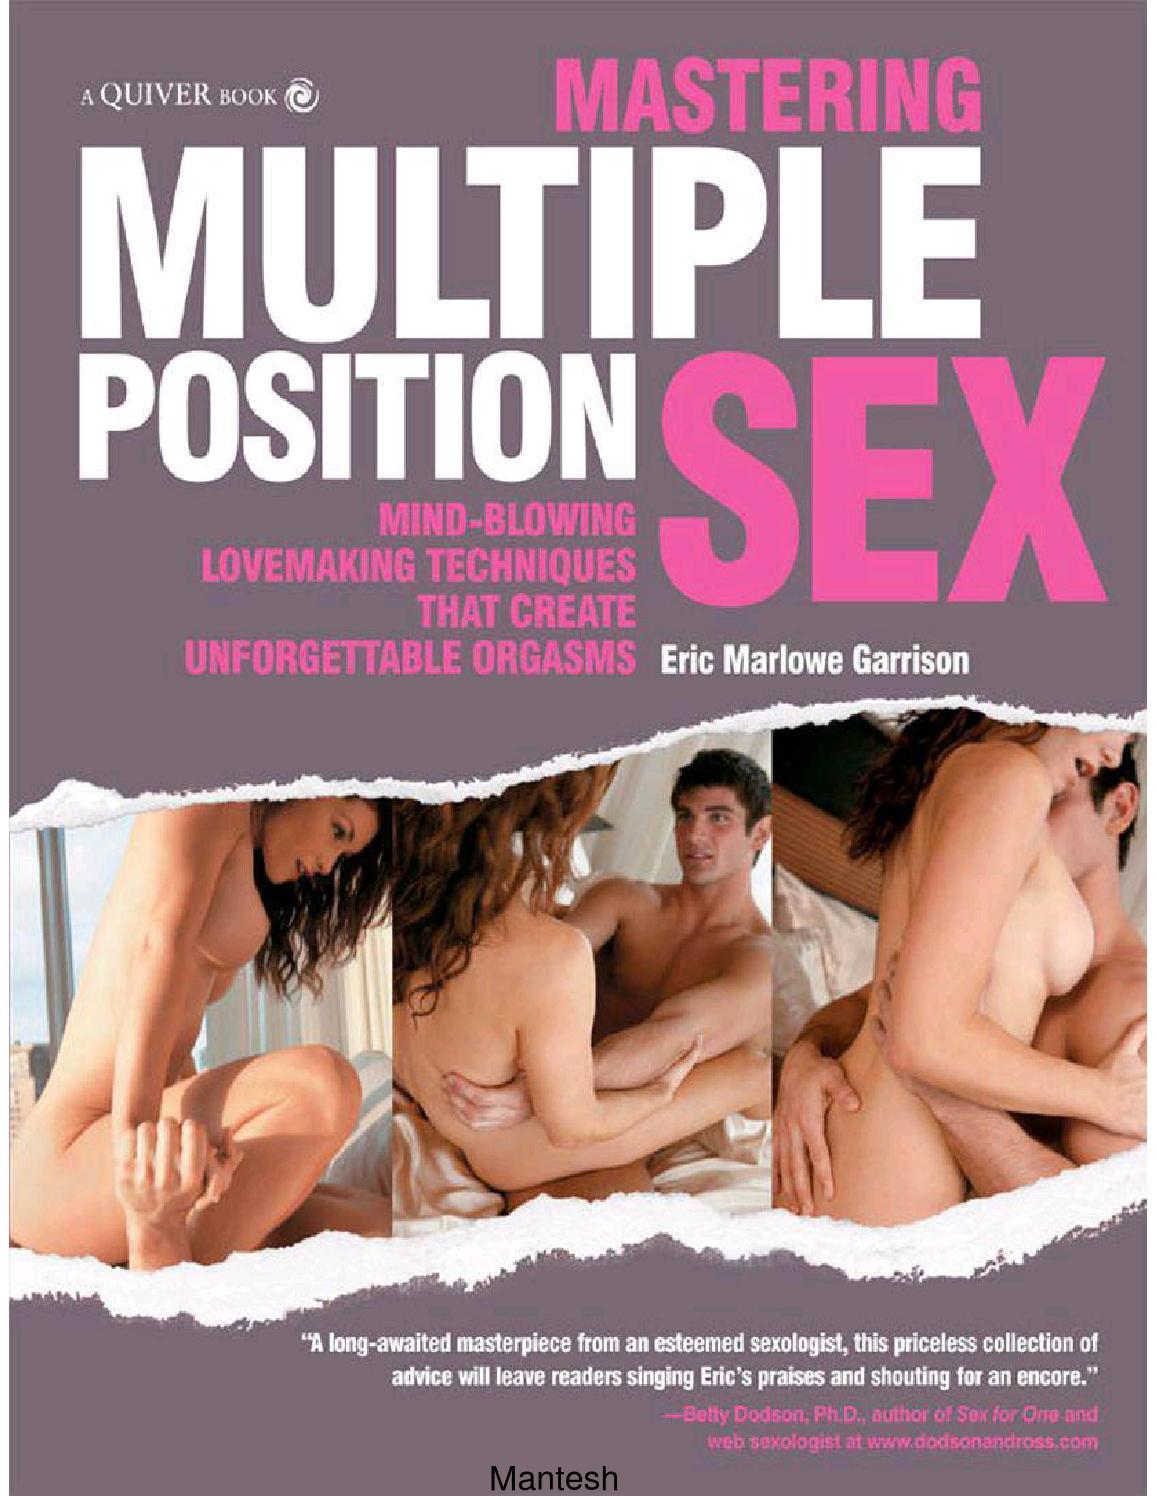 Hot nude wild sex position in humans erotic scene